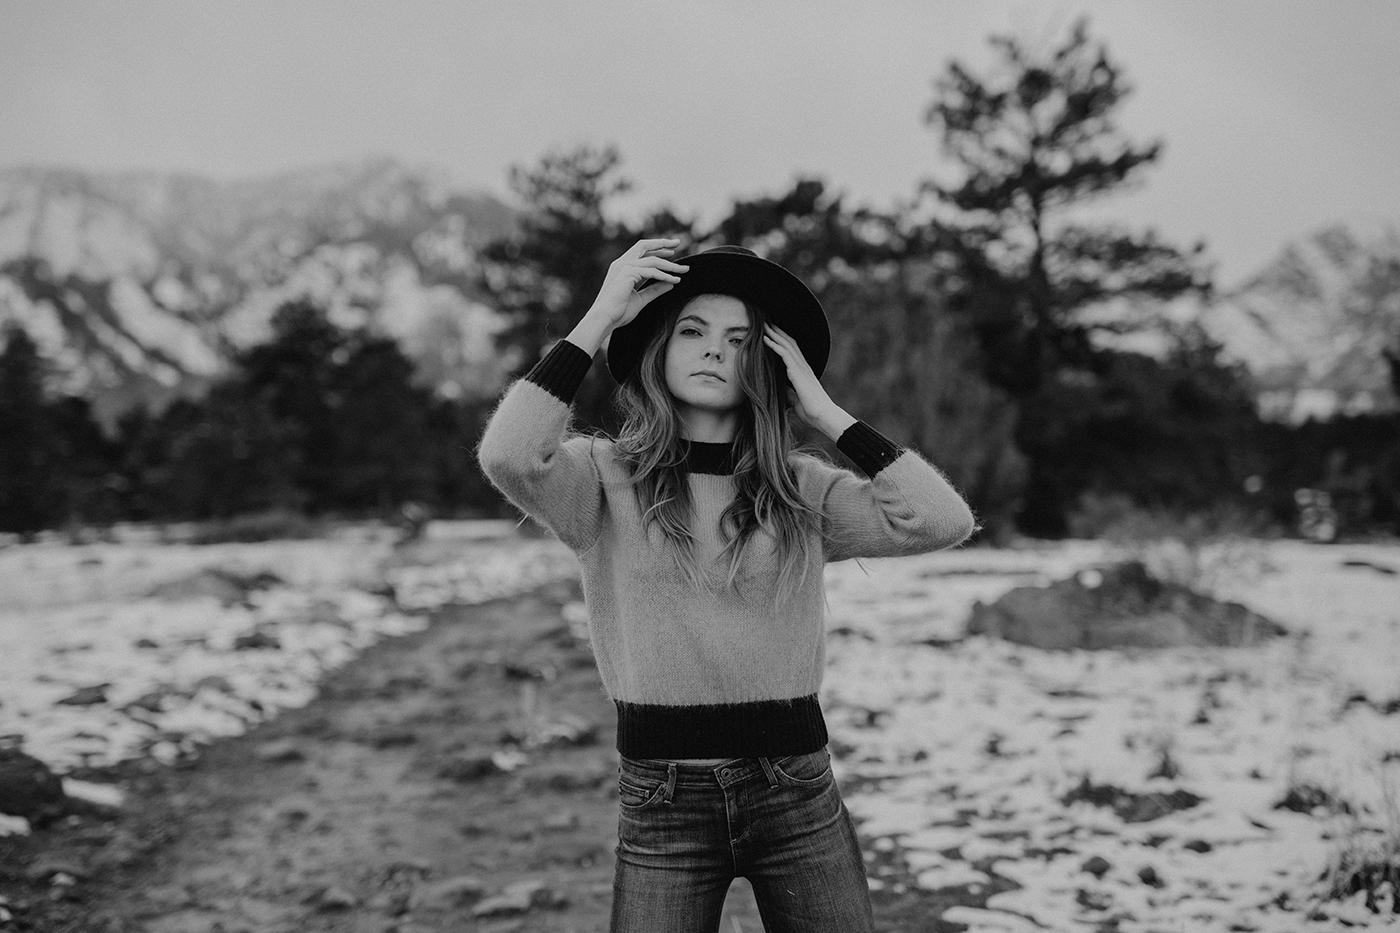 boulder-colorado-winter-snowy-trail-portrait-photographer-00001.jpg